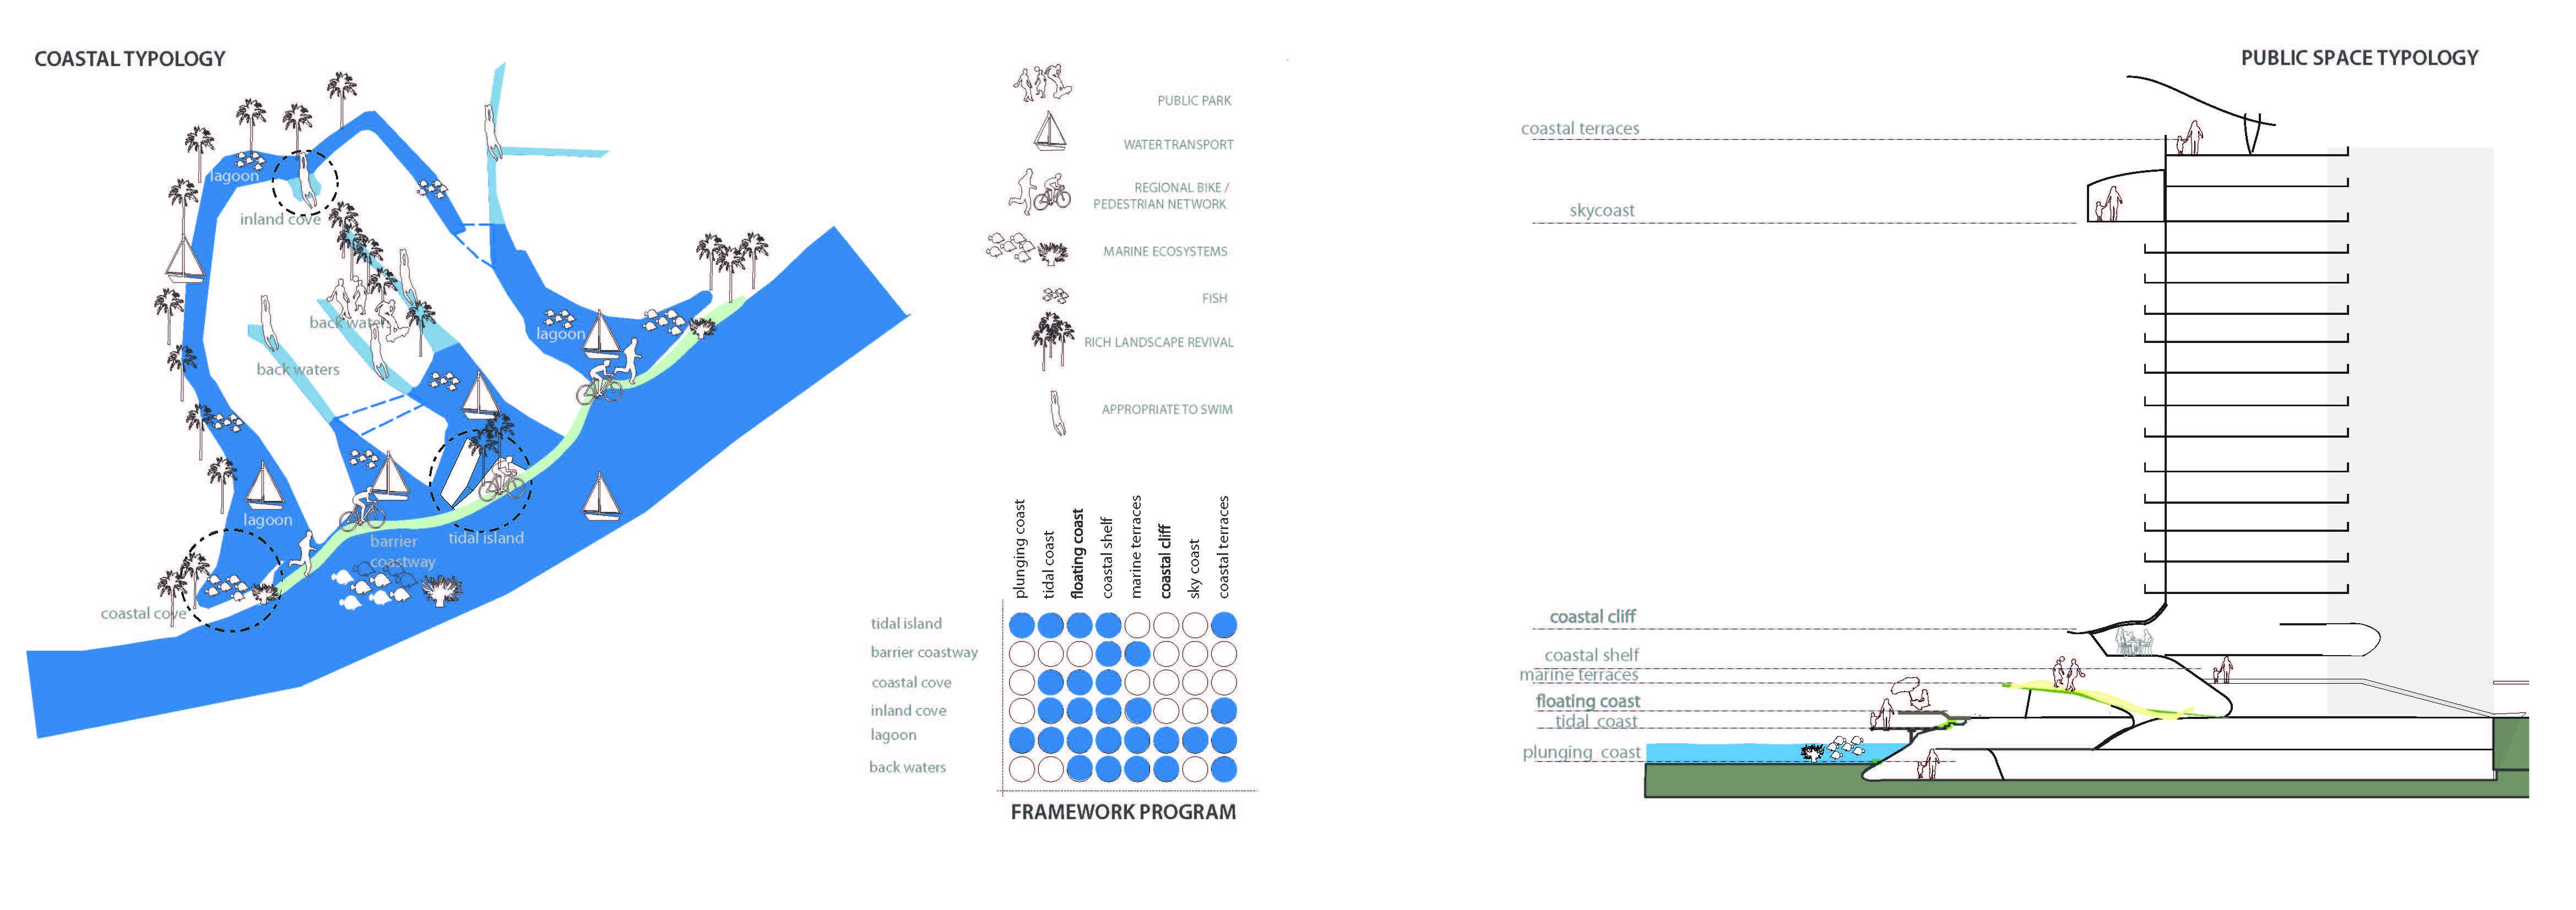 global metro urbanism- coastal defibrillation reduced_Page_11